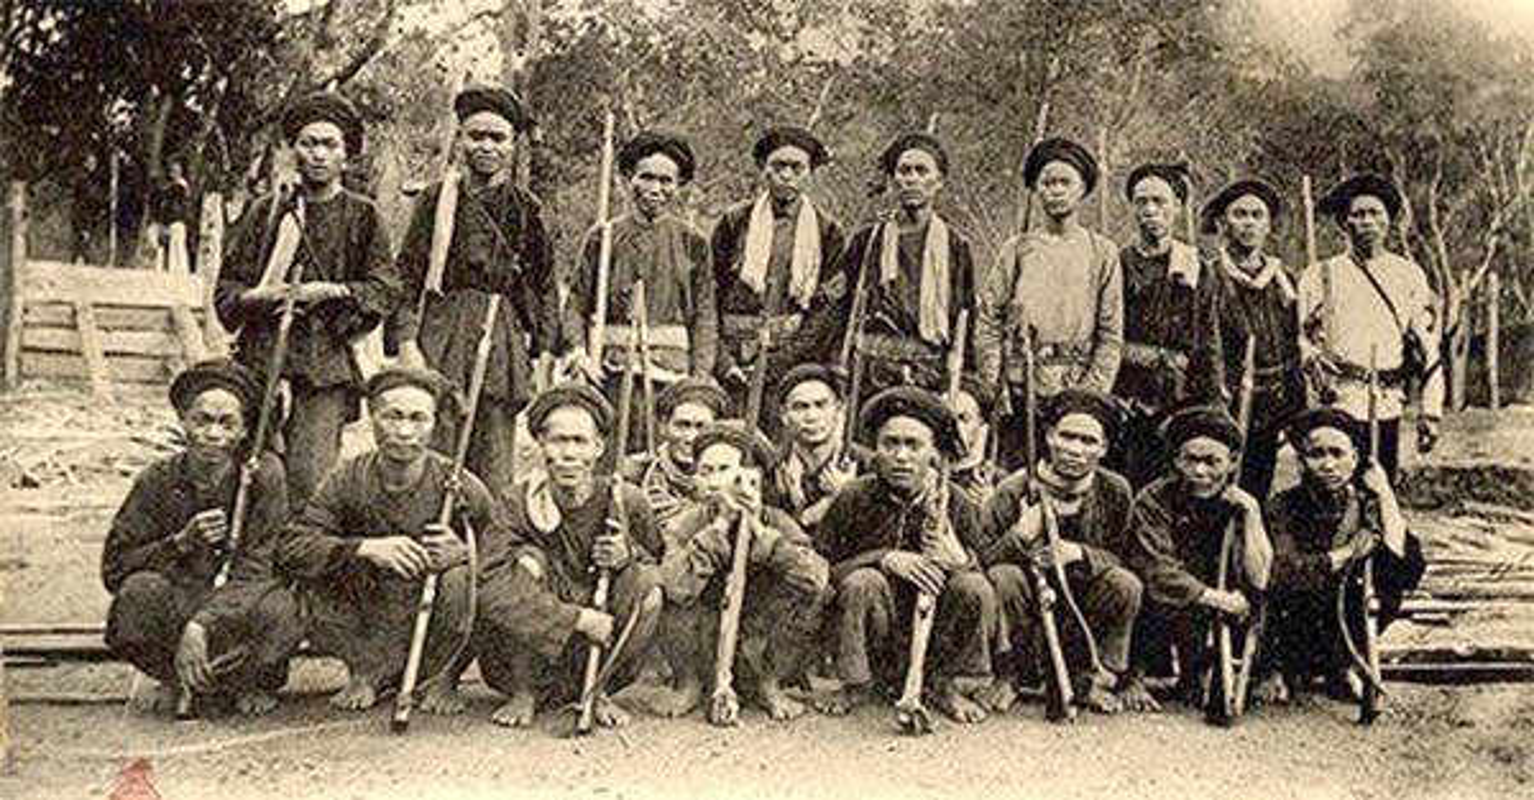 Chuyen it biet ve vu an Ha Thanh dau doc-Hinh-6